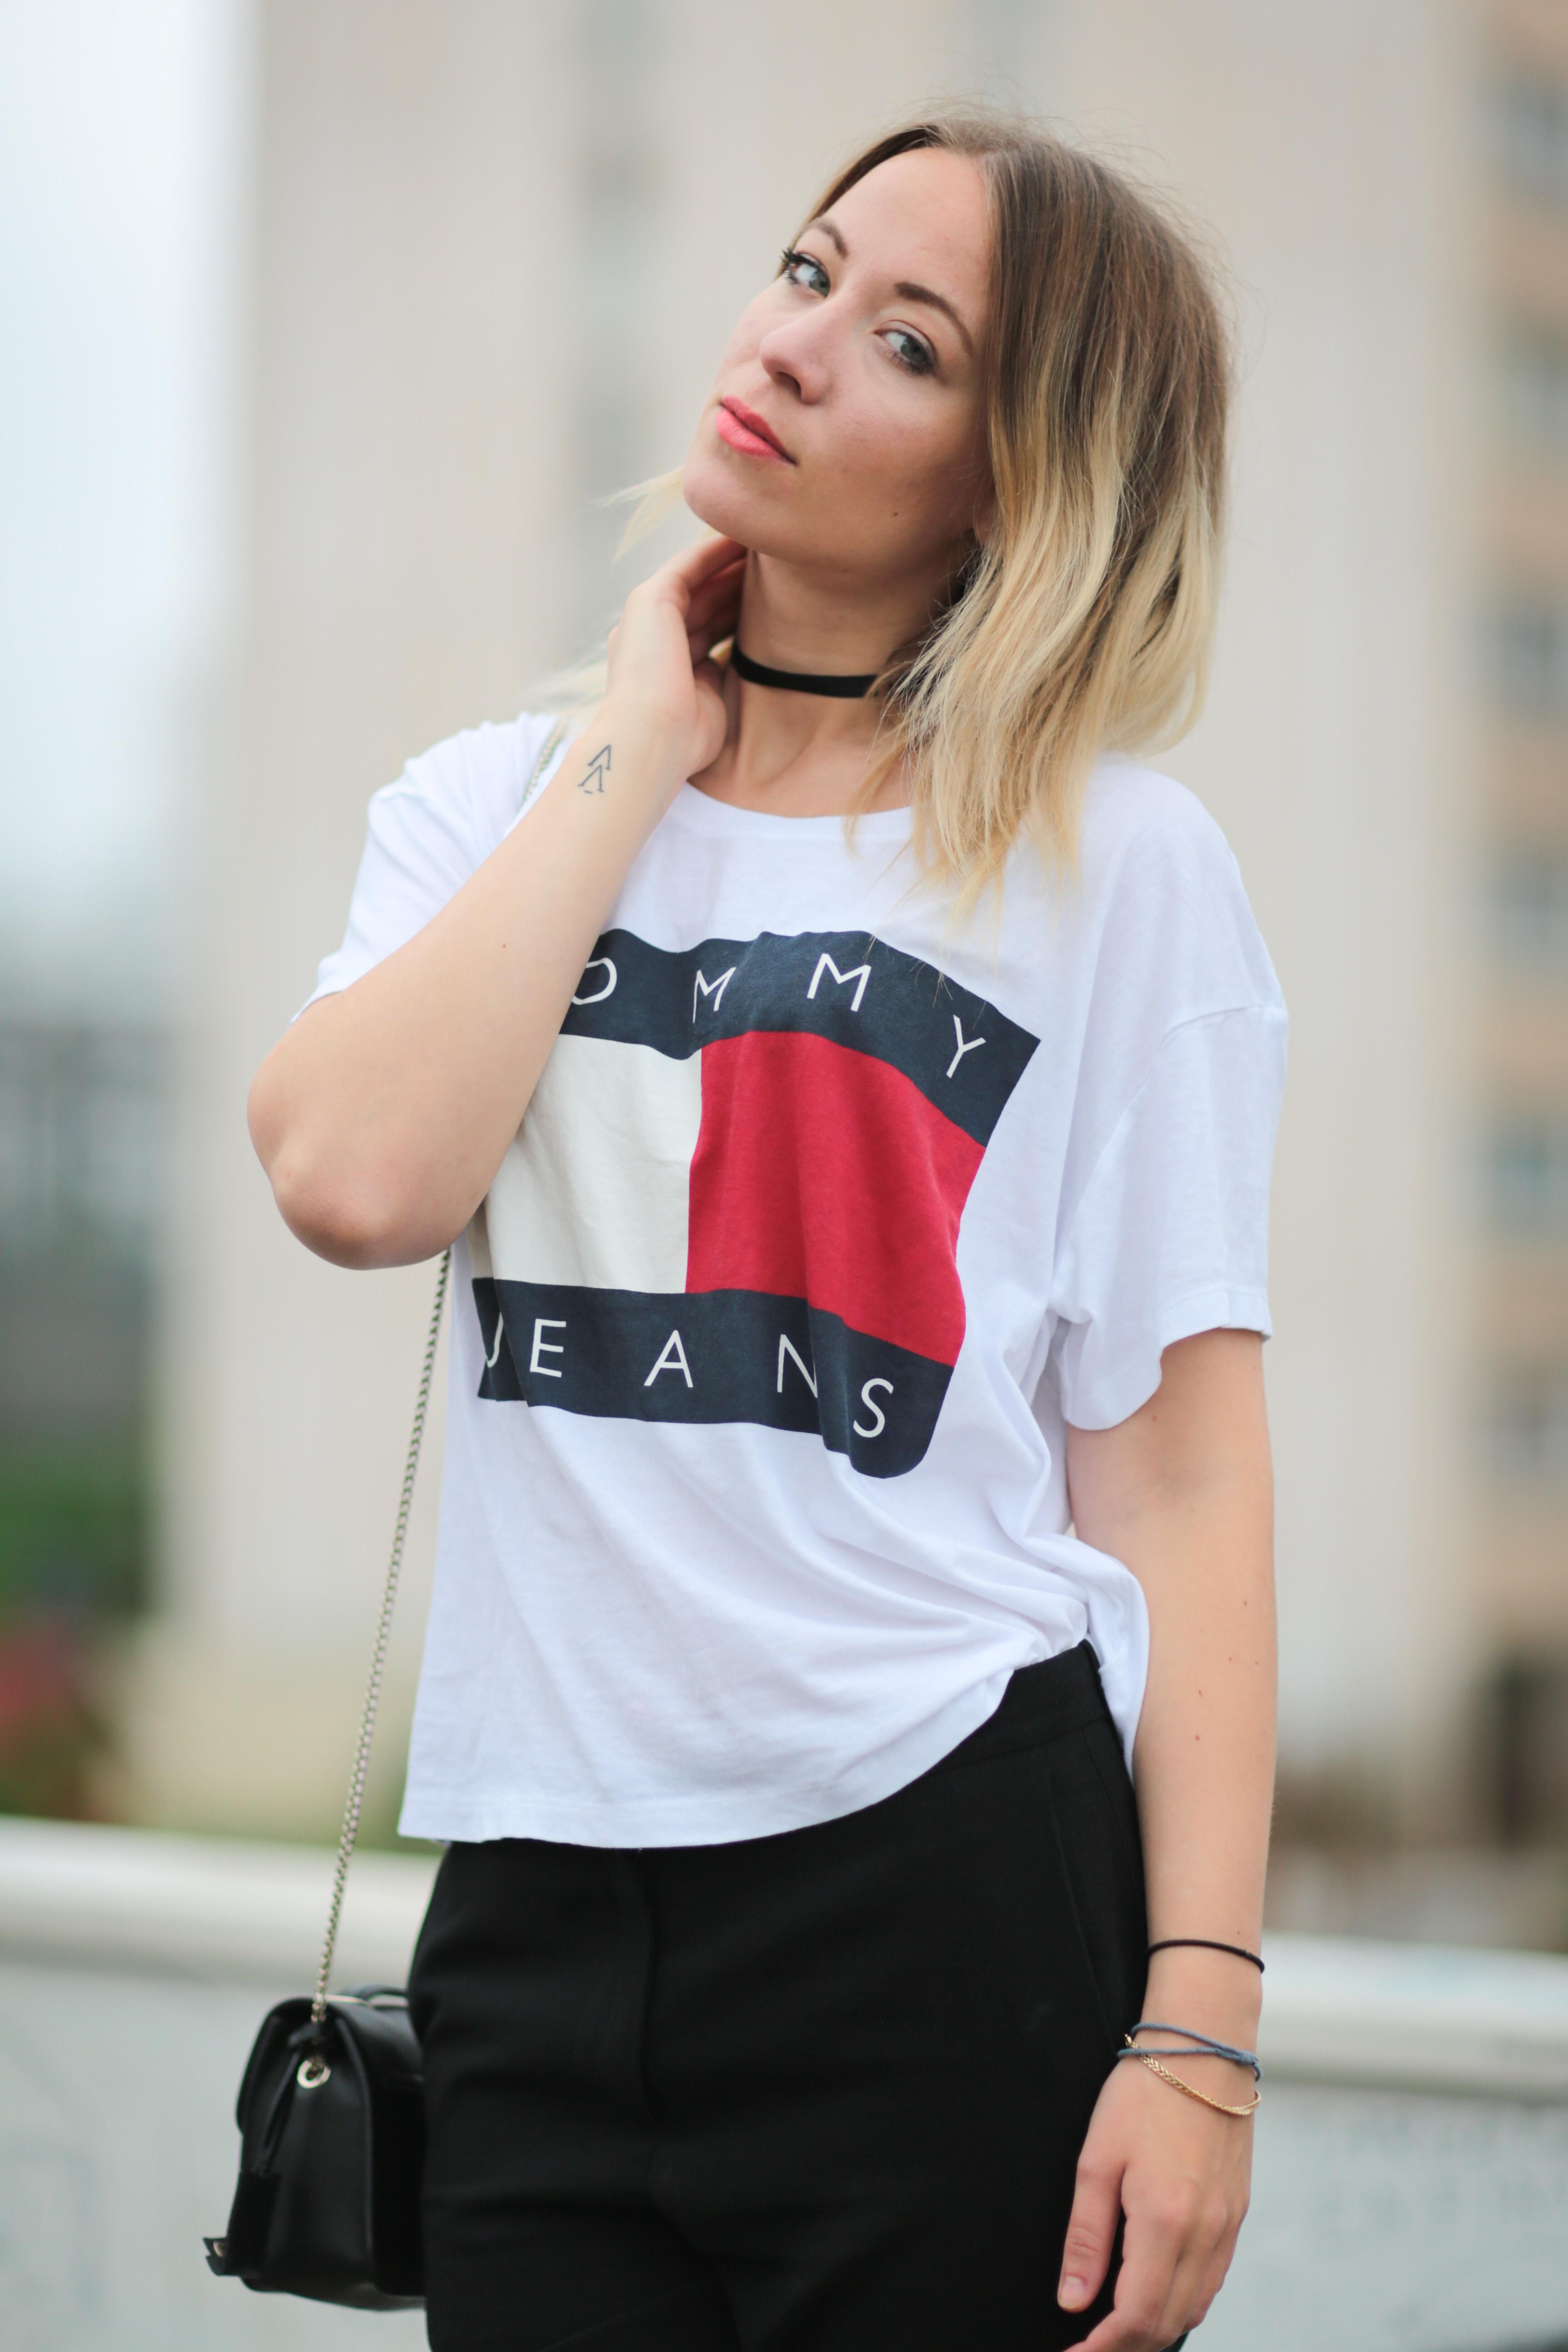 5e06b89d28c39 PARIS, FRANCE - MAY 29: Amelie Lloyd (fashion blogger @ameetslloyd) is